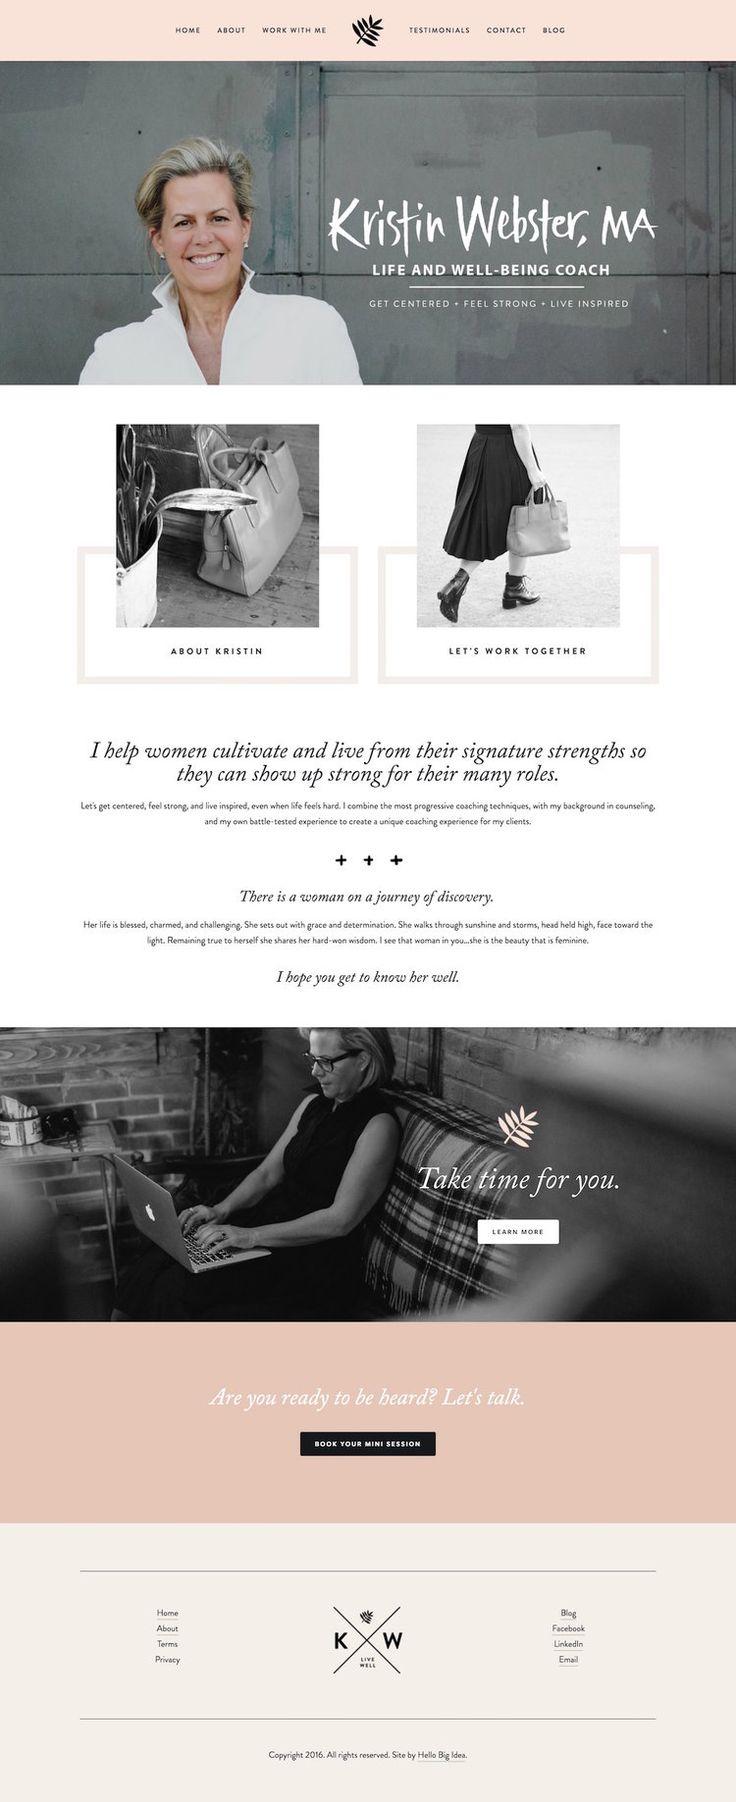 Kristin Webster Life Coach • A top 10 Squarespace feminine websites for inspiration.jpg